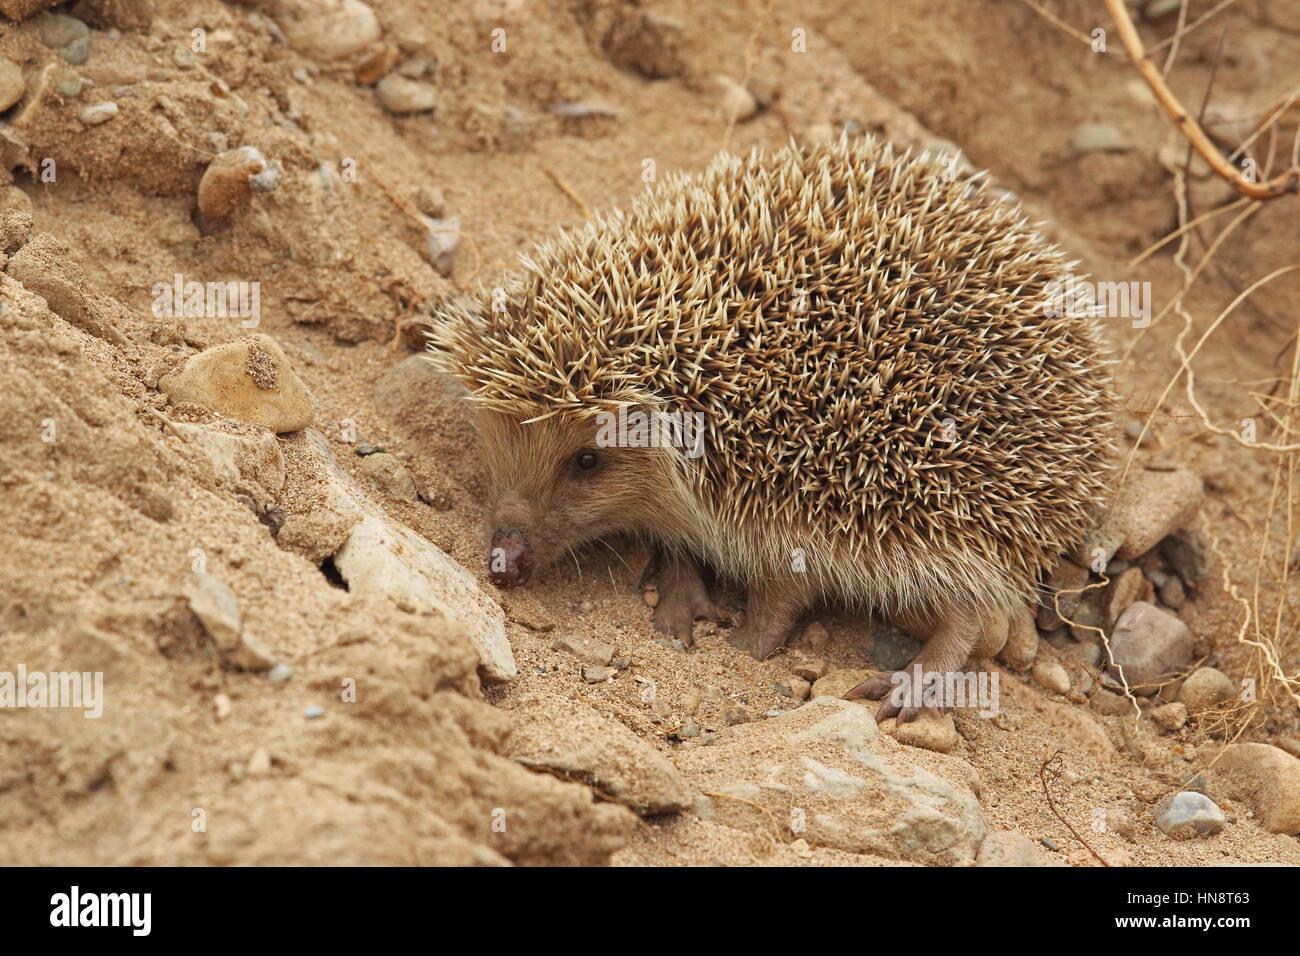 Amur Hedgehog (Erinaceus amurensis) adult cllimbing earth bank  Beidaihe, Hebei, China   May - Stock Image